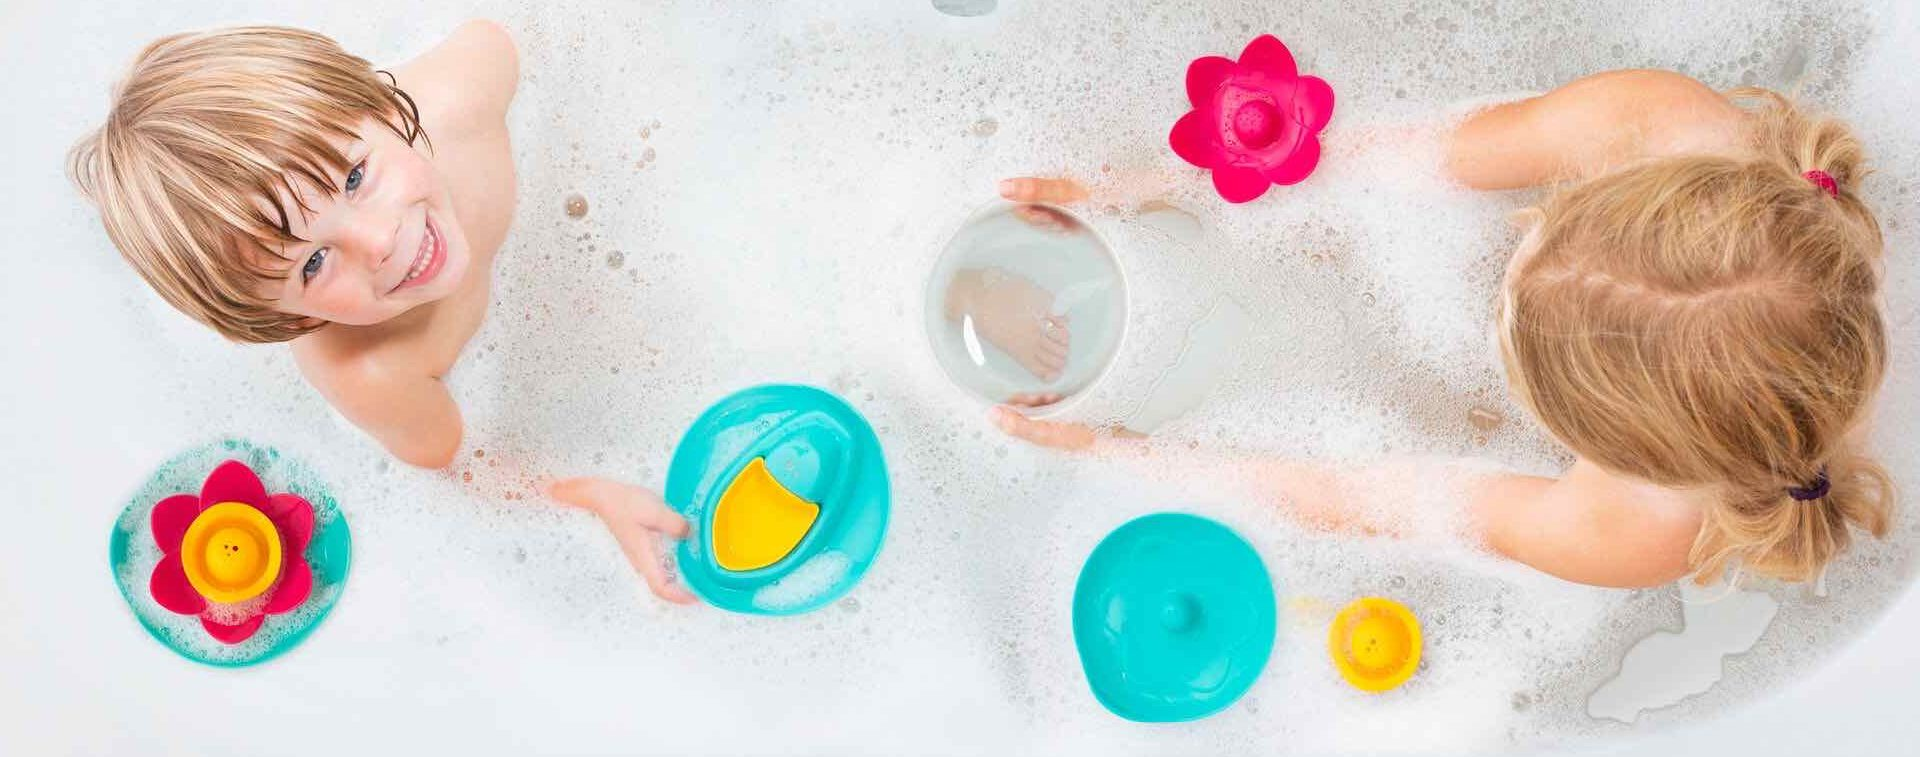 Quut_LILI-SLOOPI_inuse_bath_preview-e1523794082157